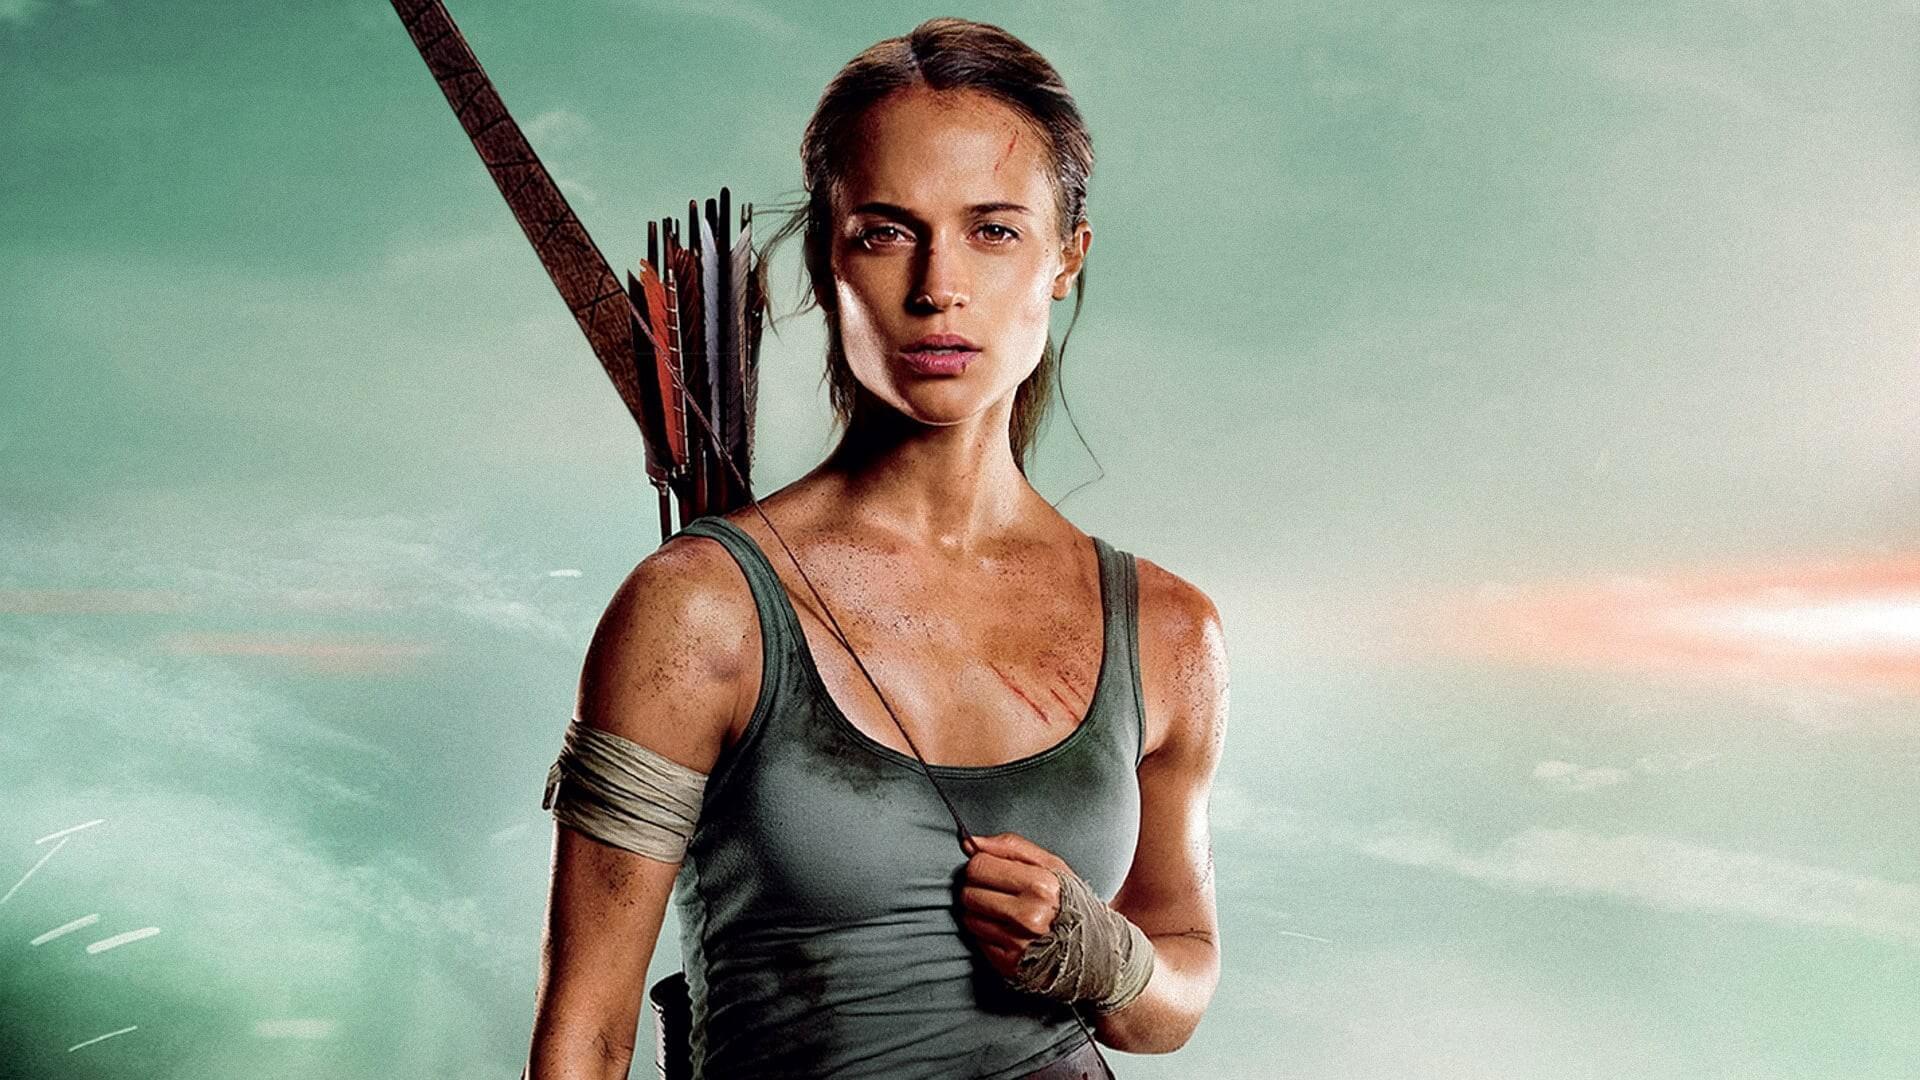 Tomb Raider 2 ficha a Ben Wheatley como director